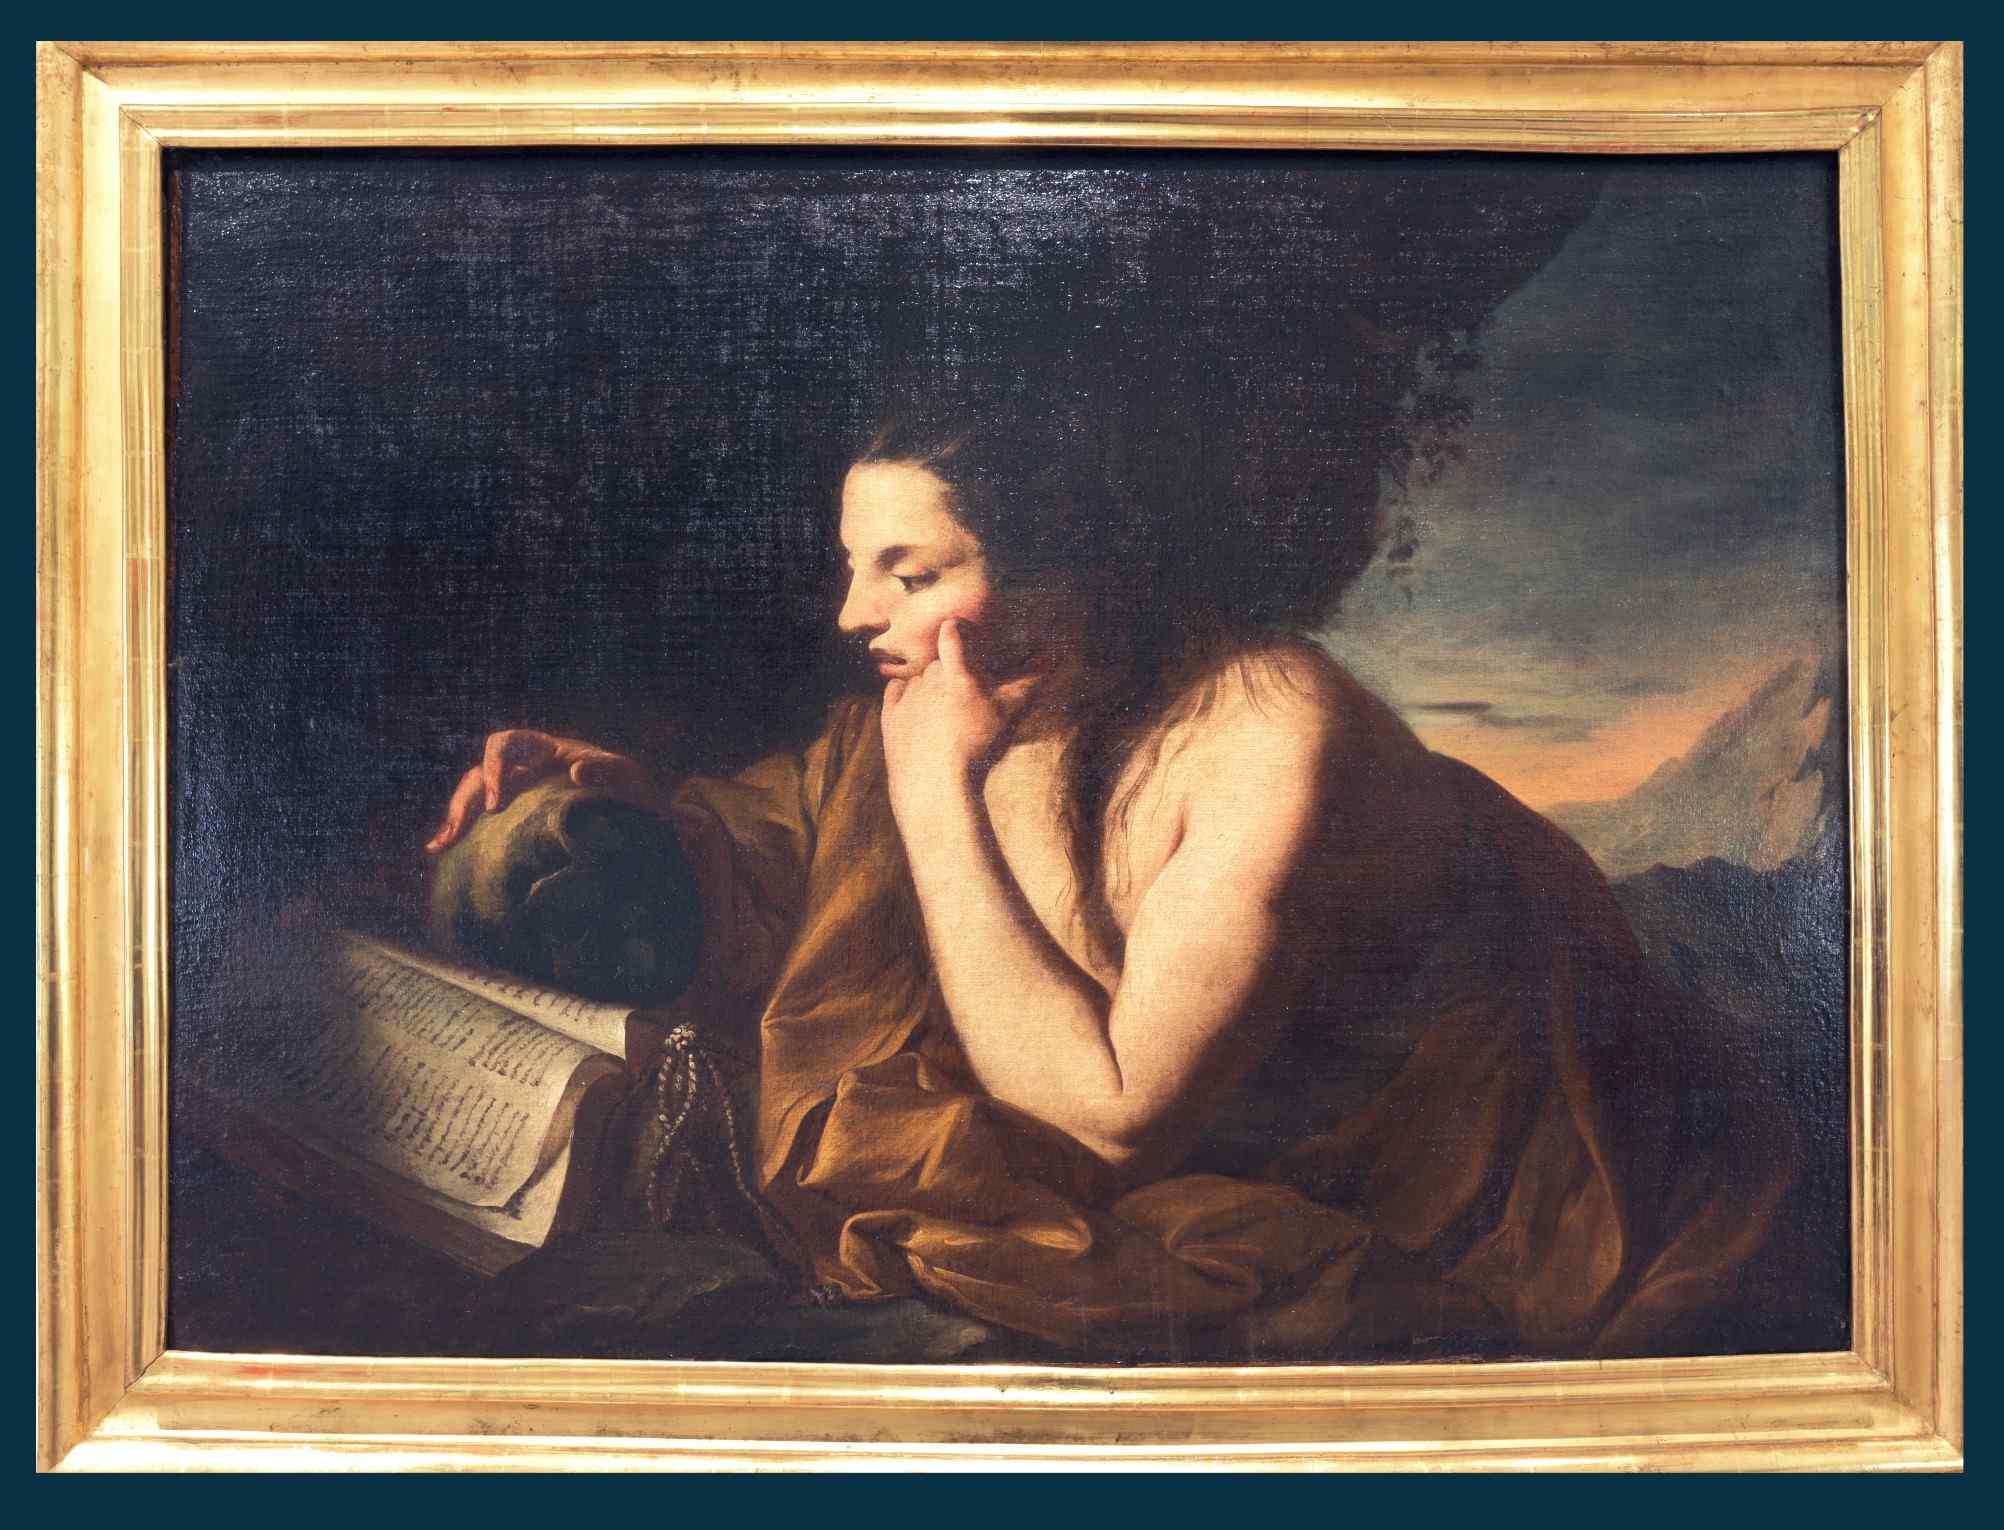 Жан Батист Сантерр (1651-1717), Мария Магдалина